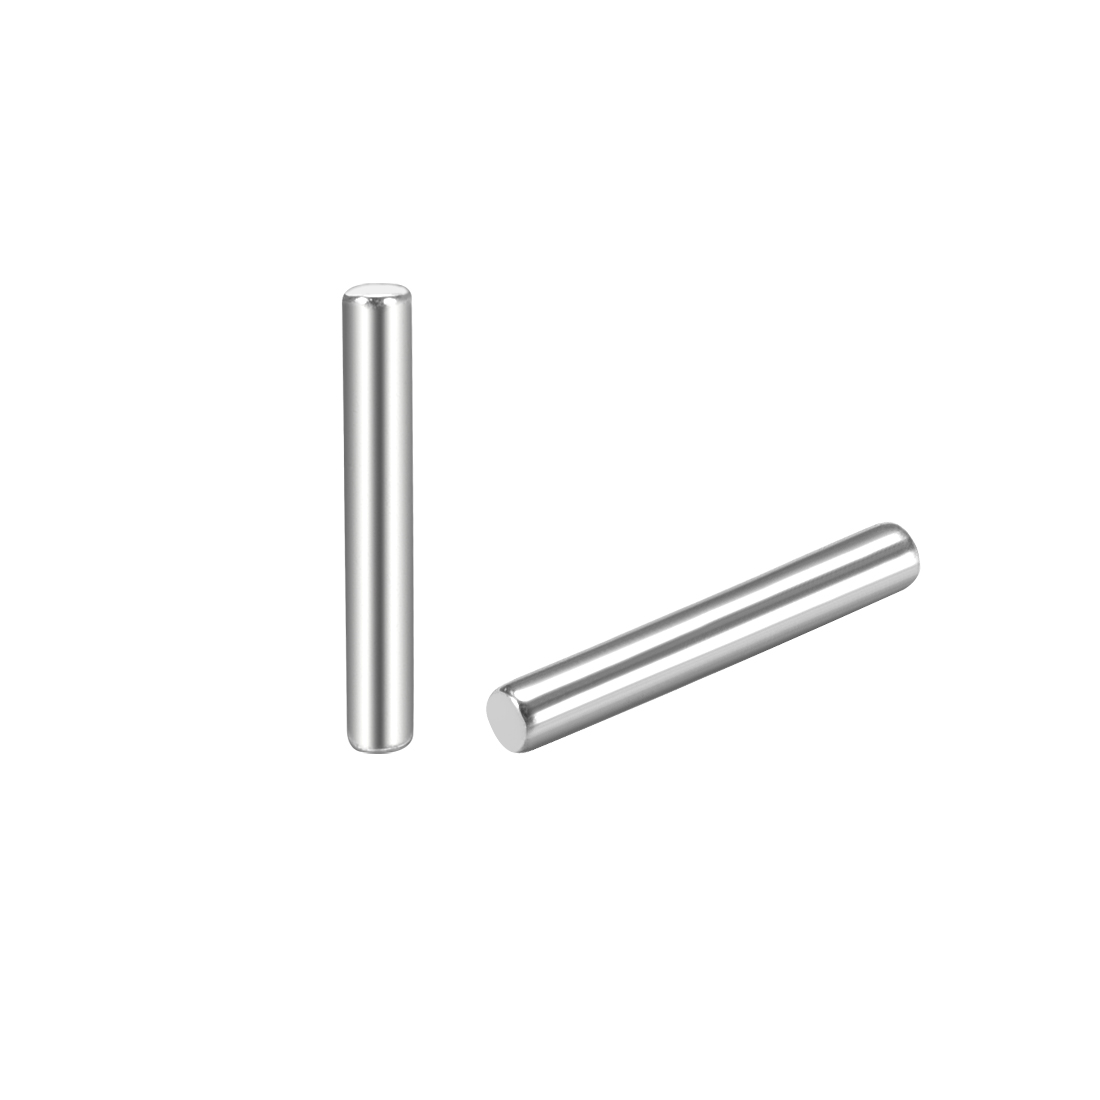 25Pcs 1.5mm x 10mm Dowel Pin 304 Stainless Steel Shelf Support Pin Fasten